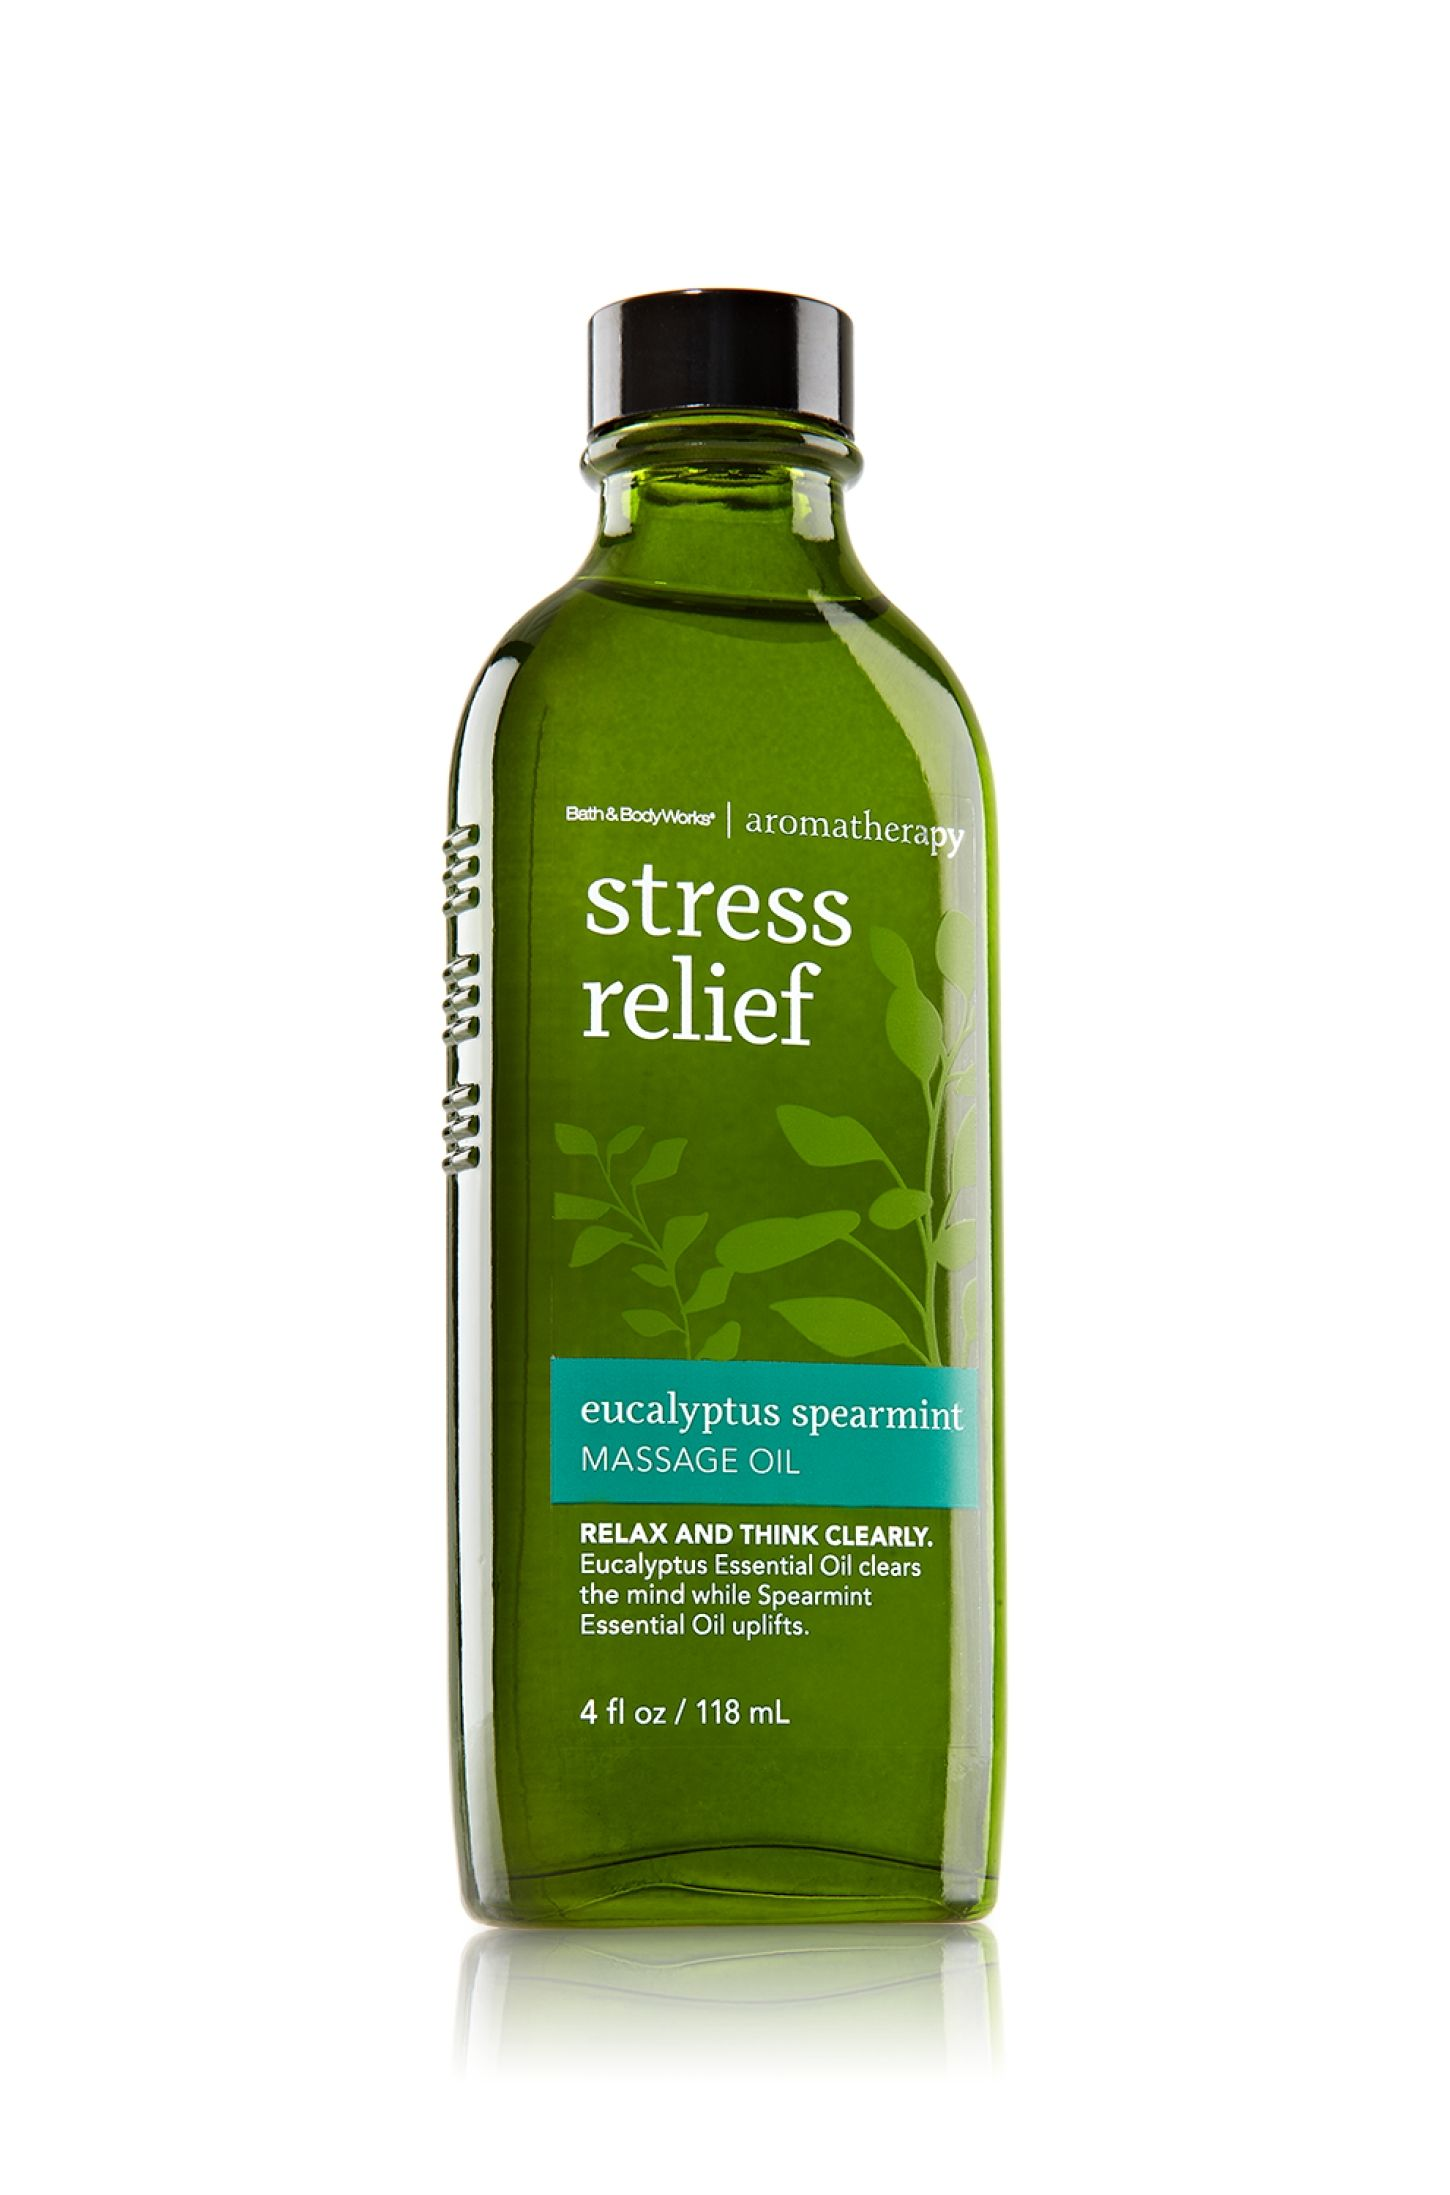 Body Lotions & Moisturizers To Invigorate Health Effectively Lot 3-bath And Body Works Aromatherapy Black Currant Vanilla Body Wash 10 Fl Oz